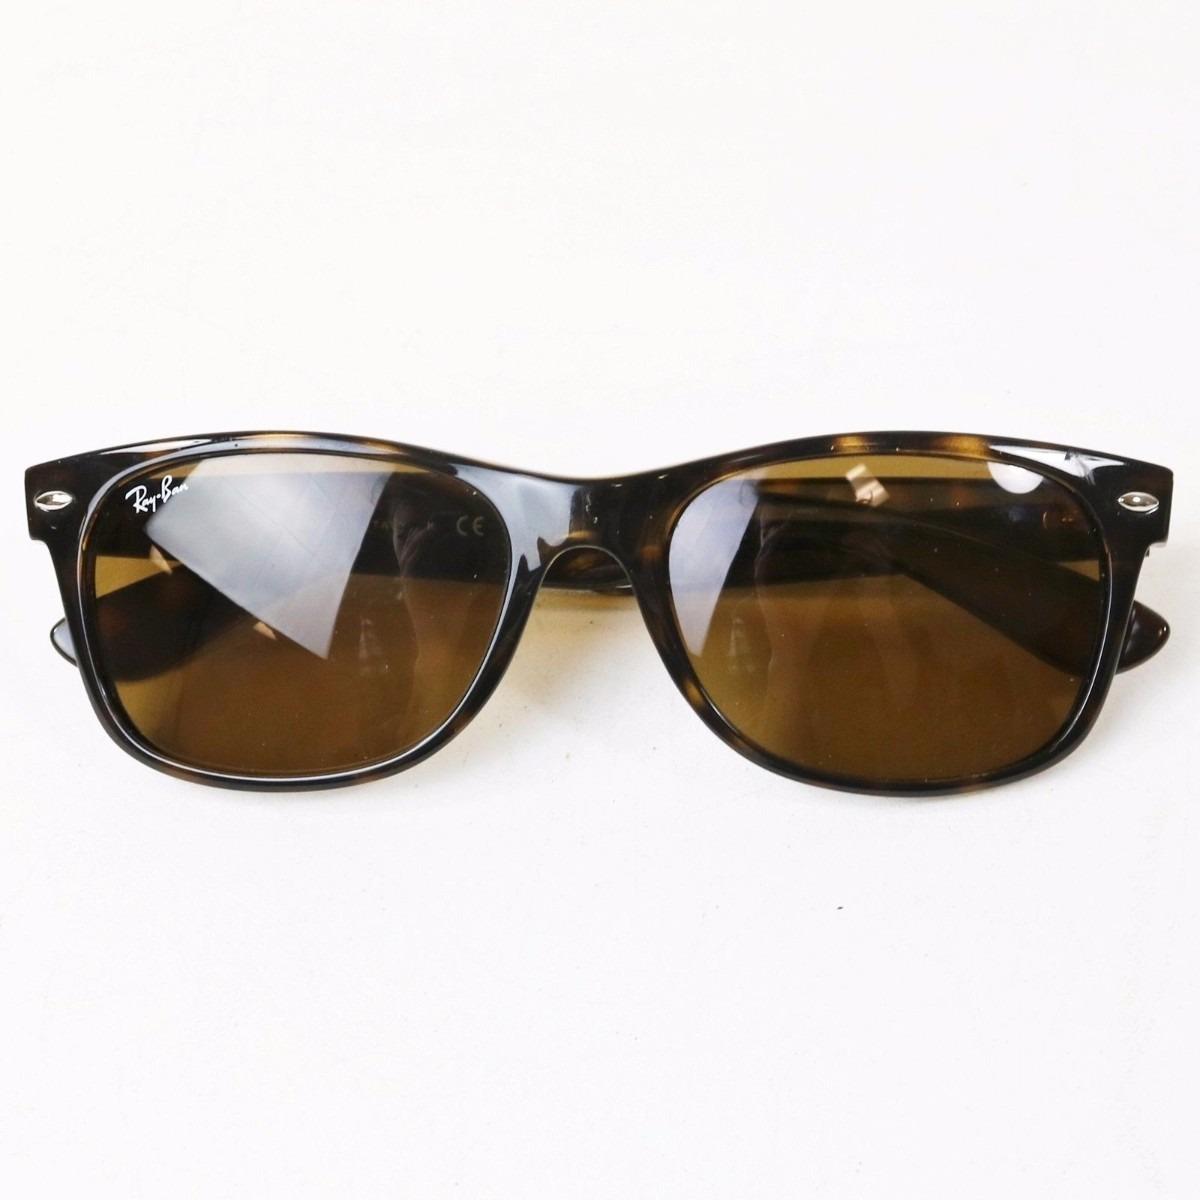 799365ab94b71 oculos rayban wayfarer rb2140 masculino feminino oferta. Carregando zoom.